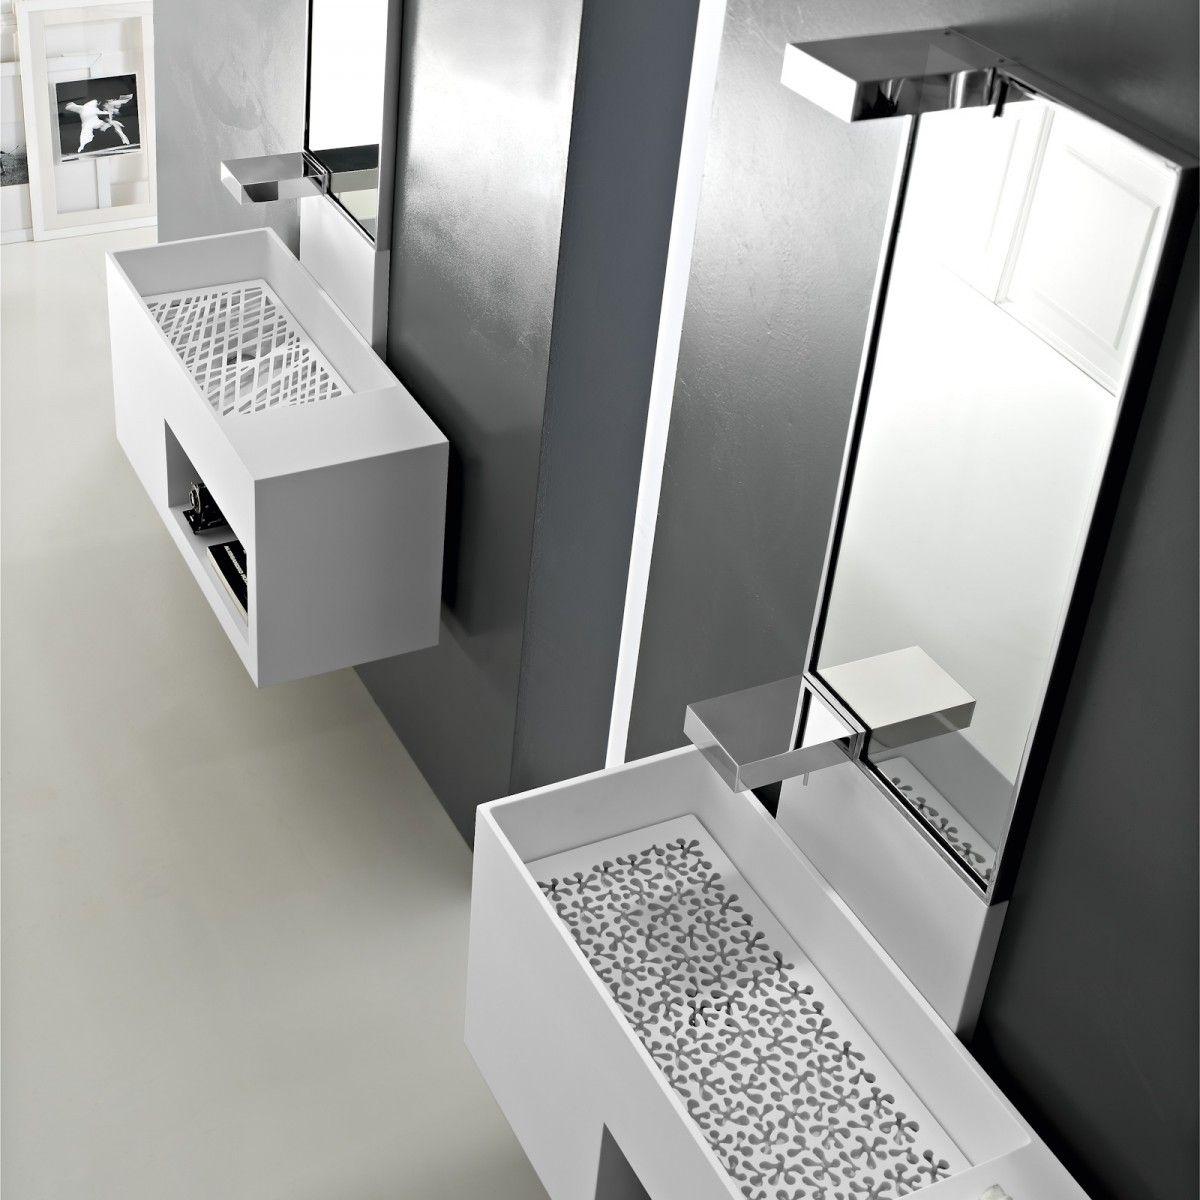 Bathroom, Modern Bathroom Basin Cabinet Design For Italian Bathroom Design  Ideas And White Bathroom Ideas: Various Kind Of Bathroom Vanity In Modern  Italian ...